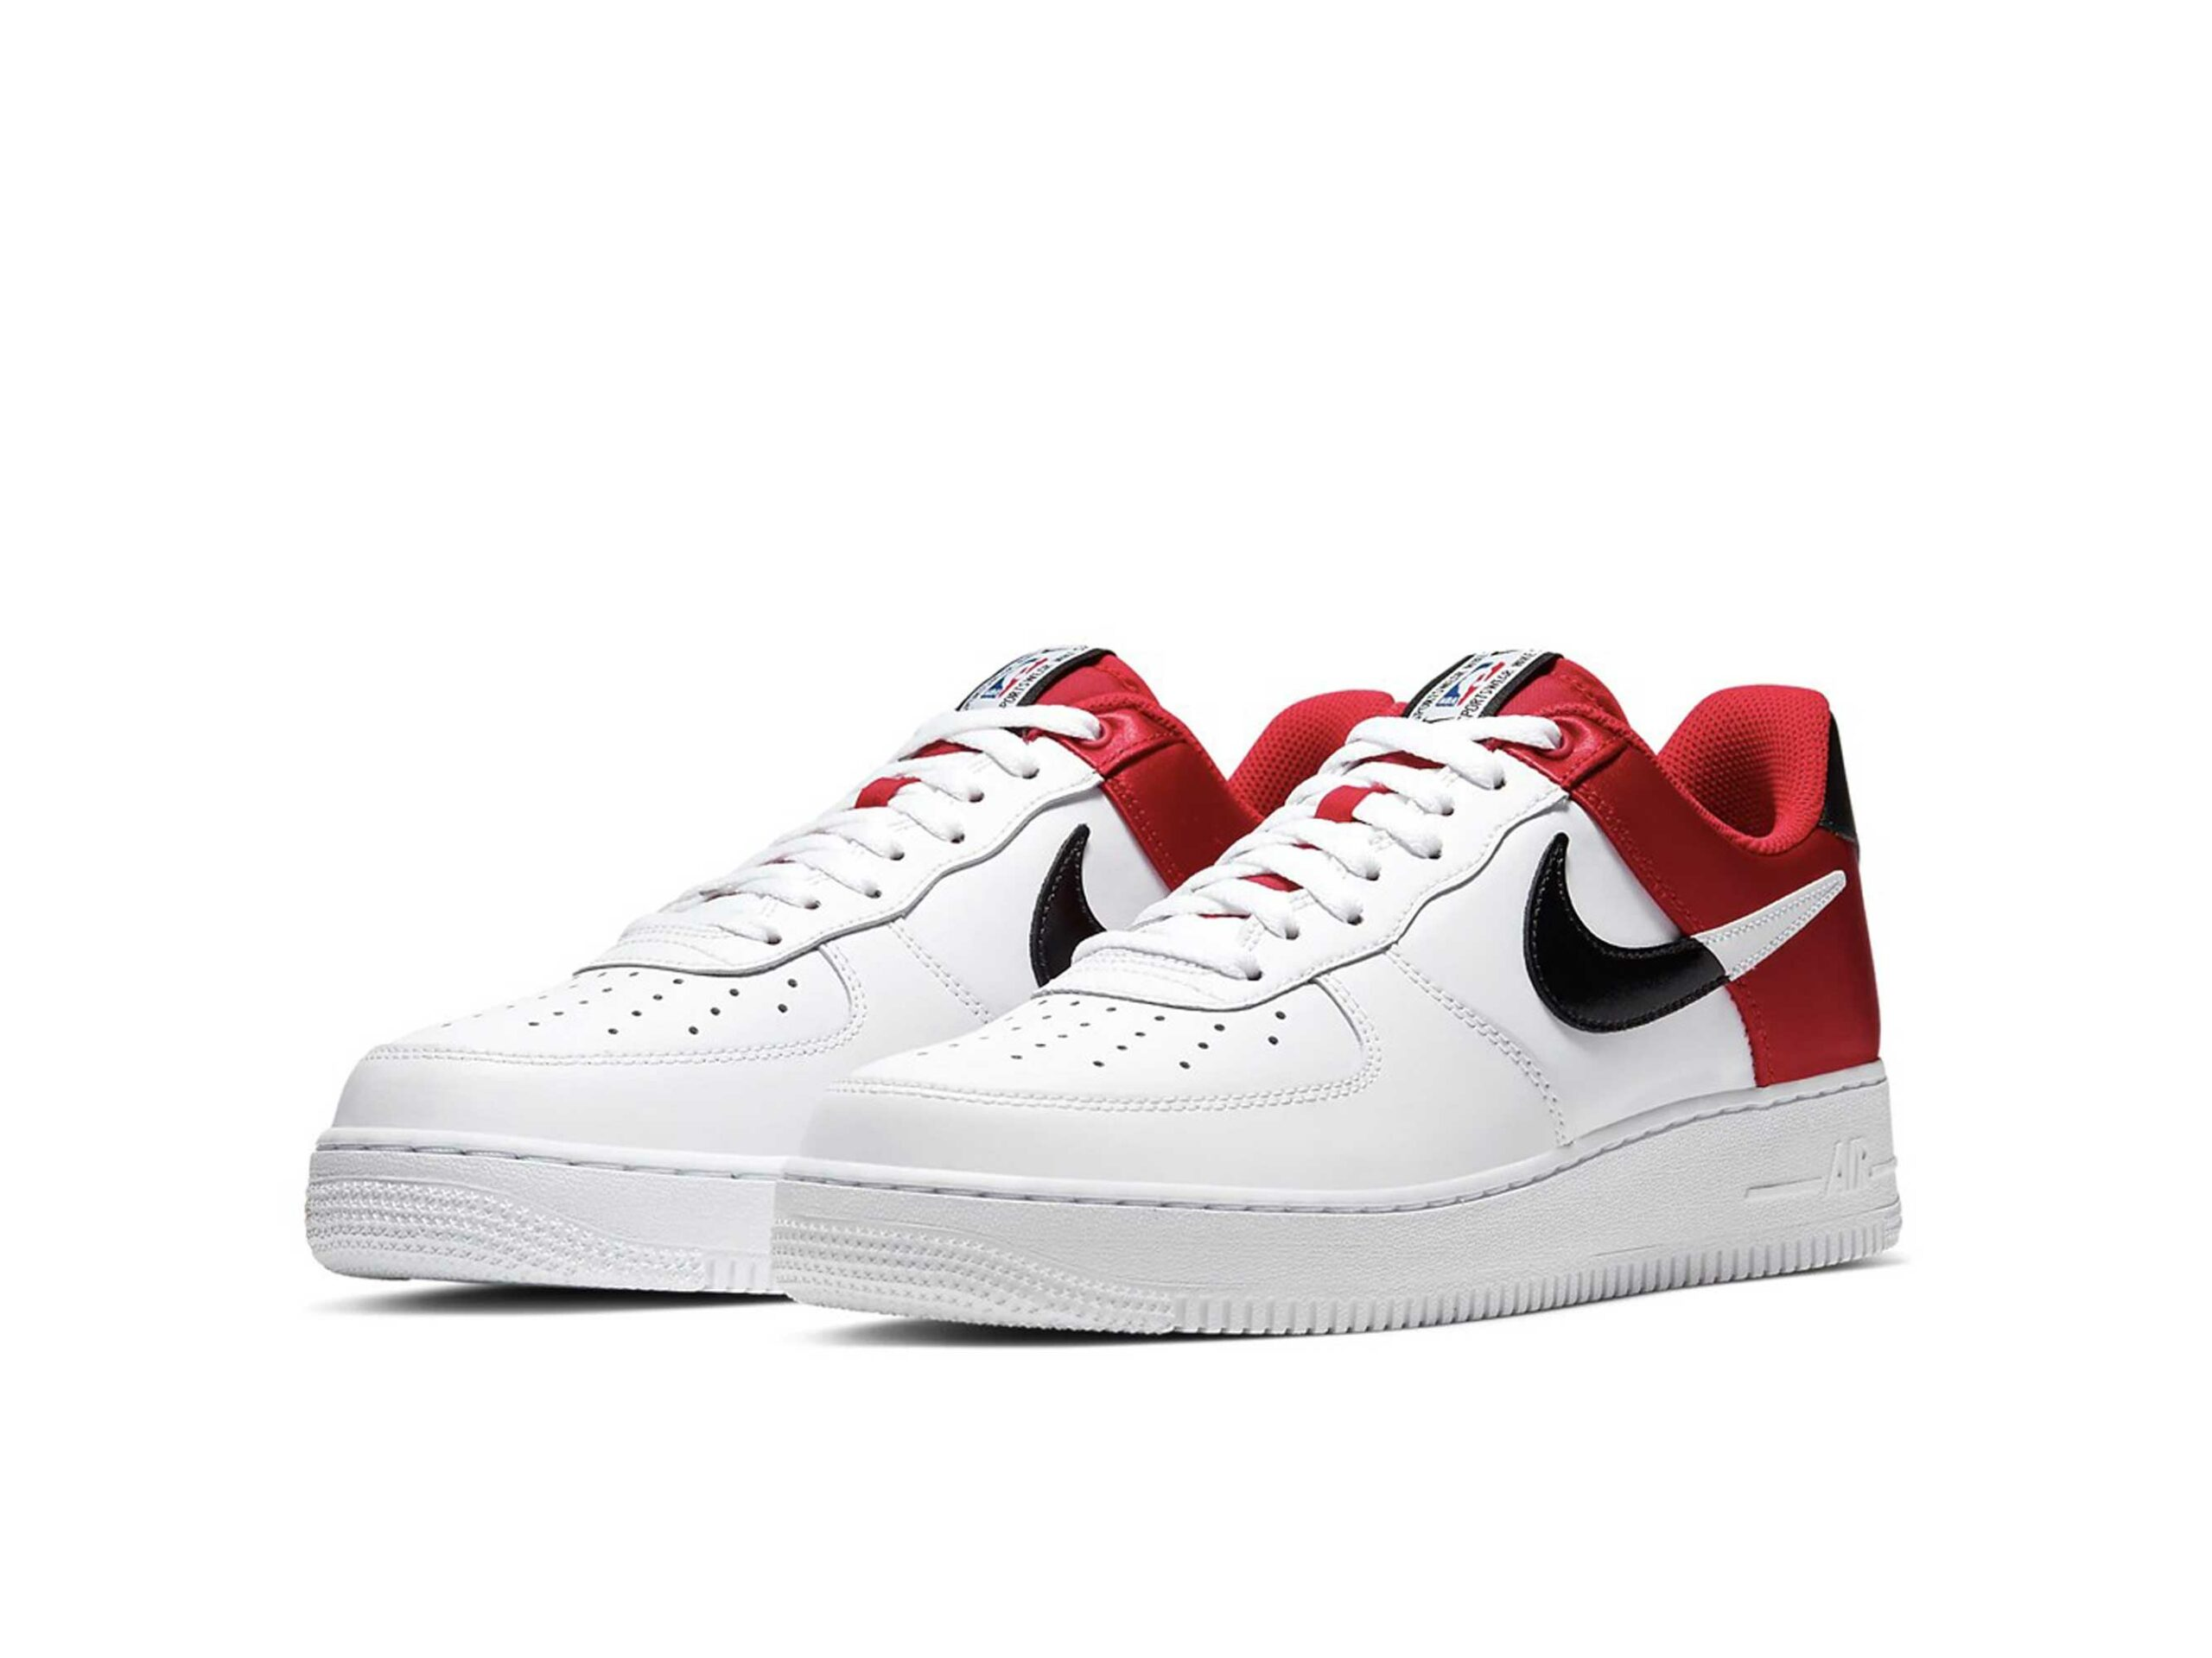 nike air force 1 '07 LV8 NBA white black red купить